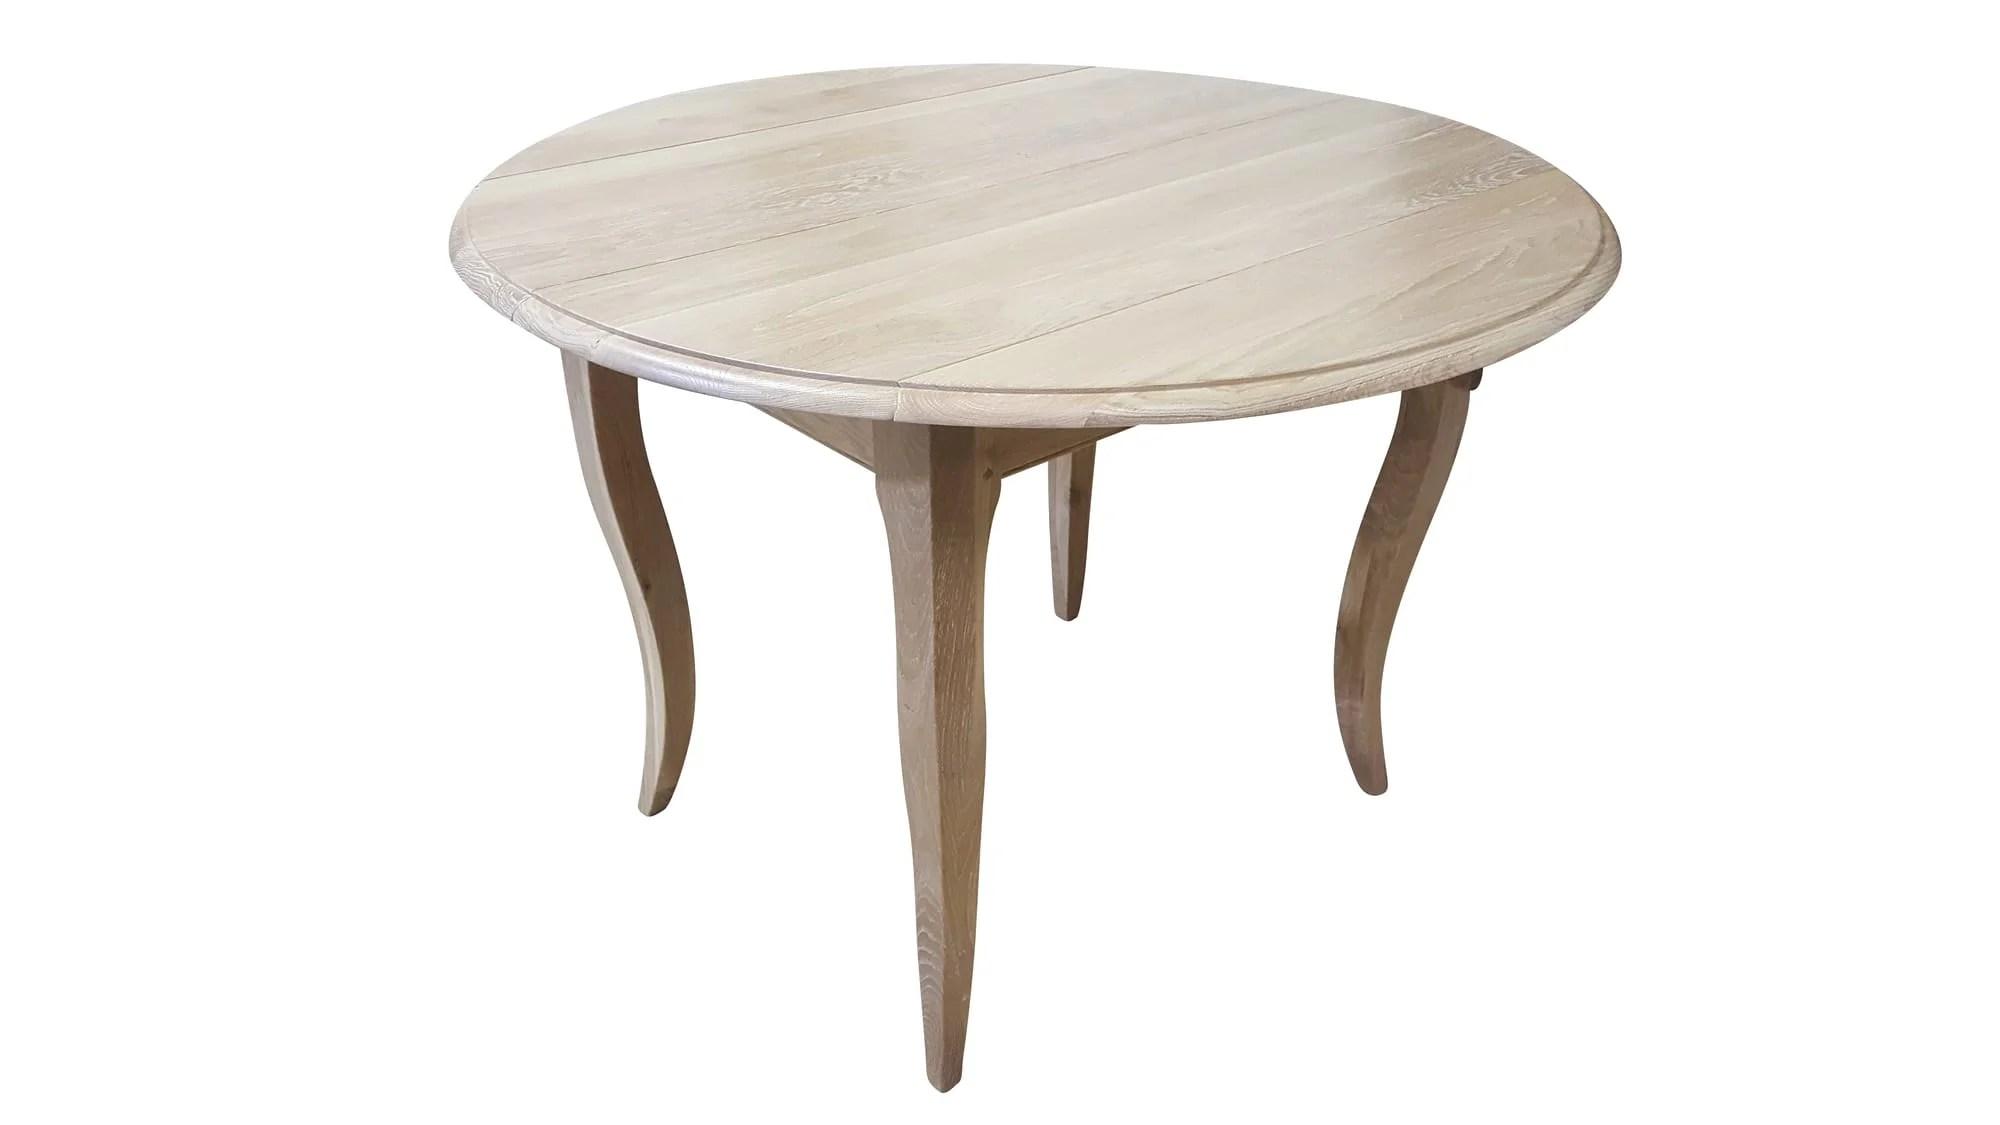 Table Ceruse Blanc Beautiful Vdf Crus Blanc White Cruse With Table Ceruse Blanc Table Ceruse